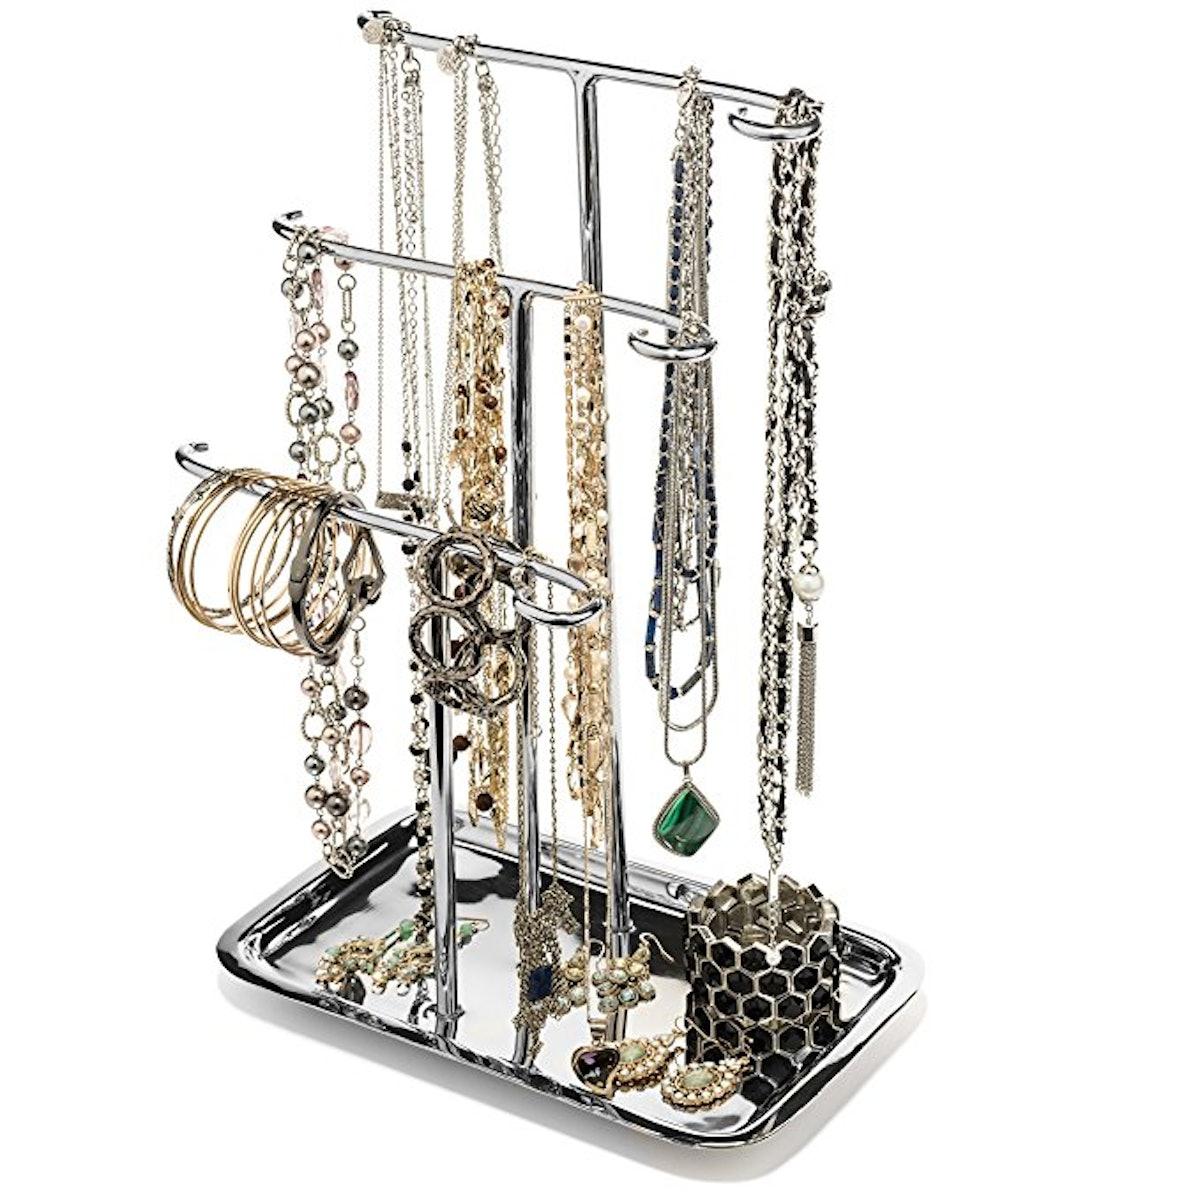 H Potter Jewelry Organizer